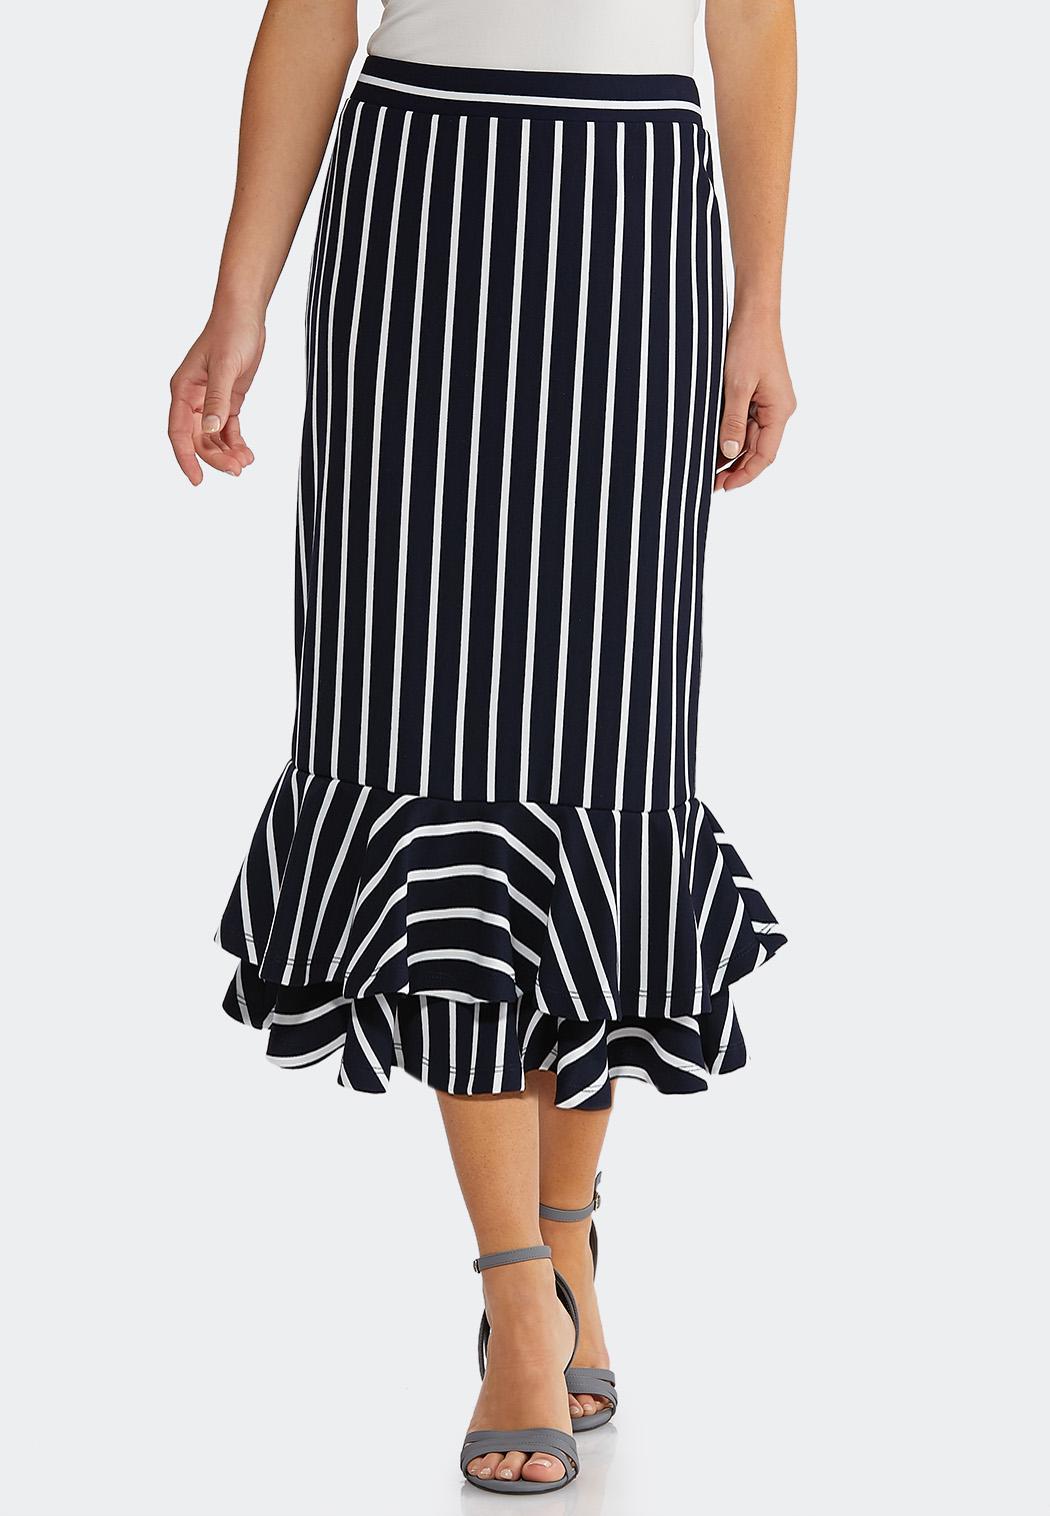 528f1a9ff Plus Size Dressy Skirt – DACC